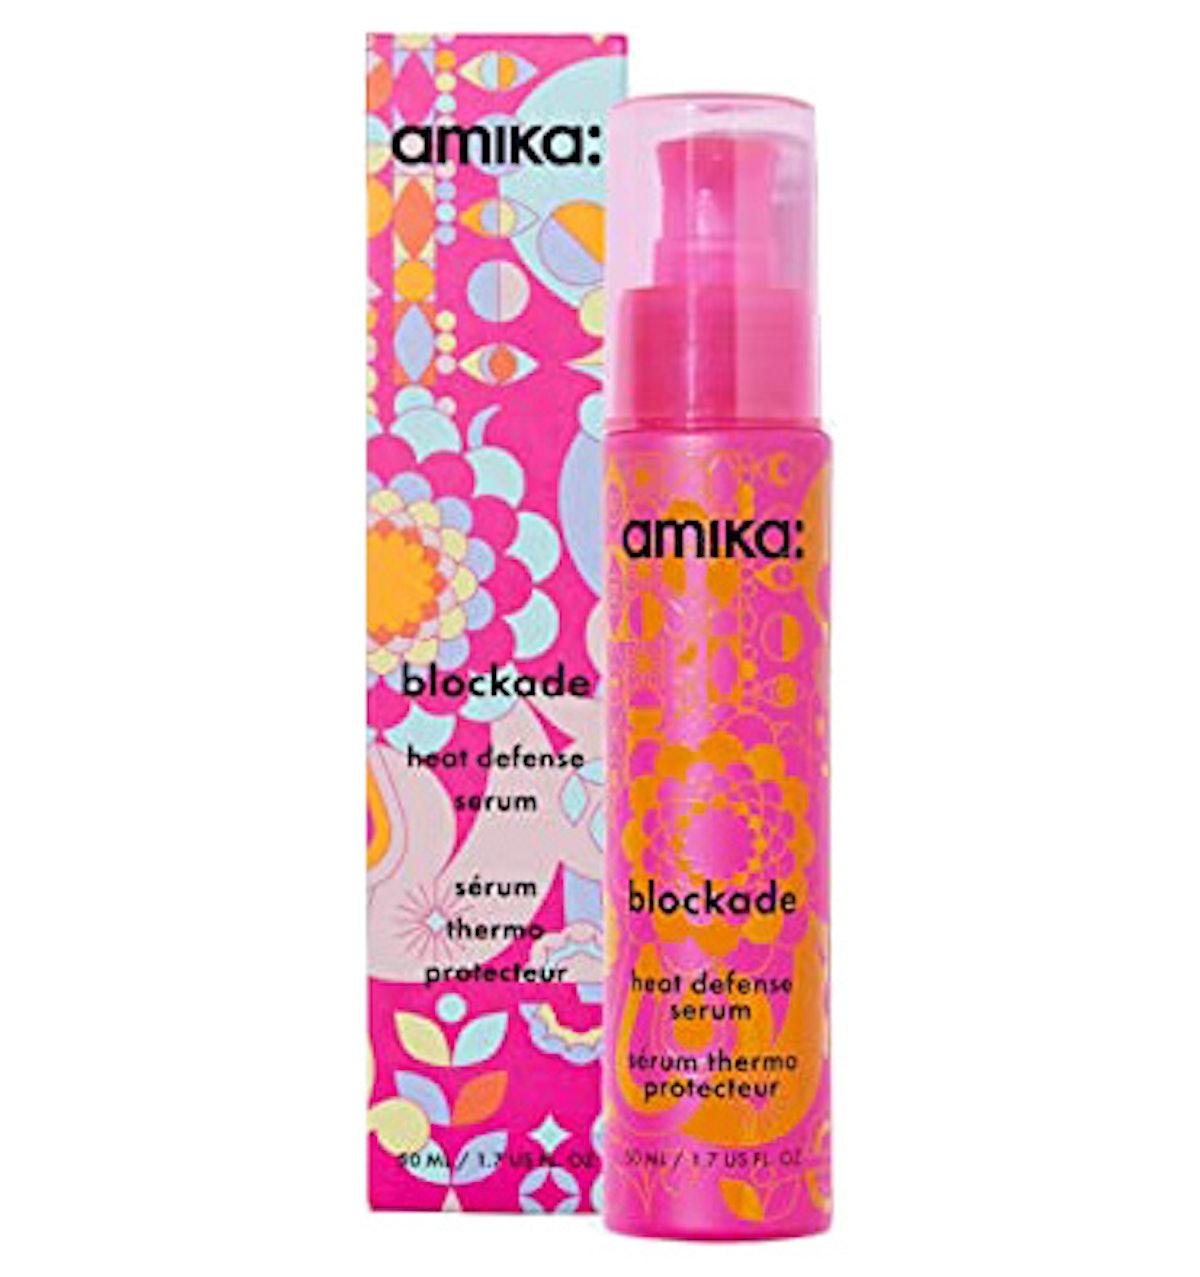 amika Blockade Heat Defense Serum